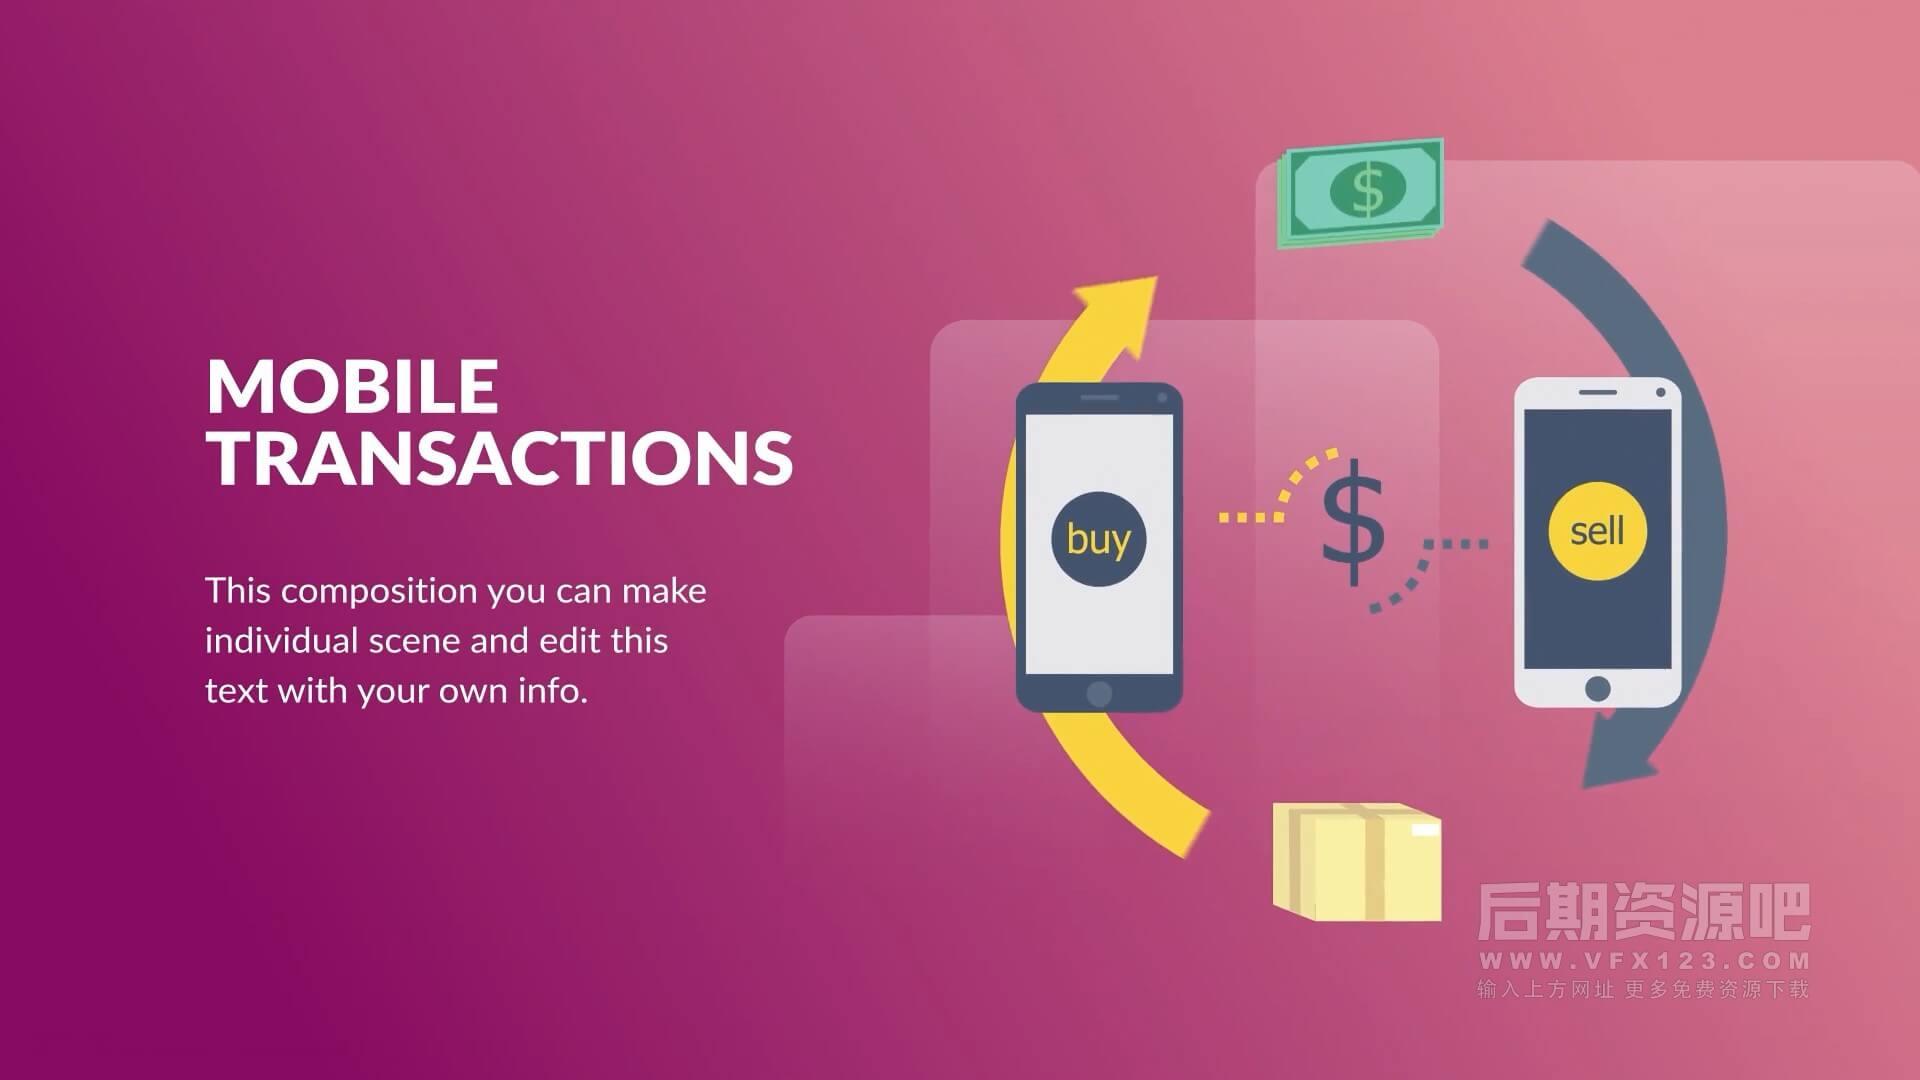 fcpx插件 银行金融体系相关演示文稿场景动画包 Banking and Finance